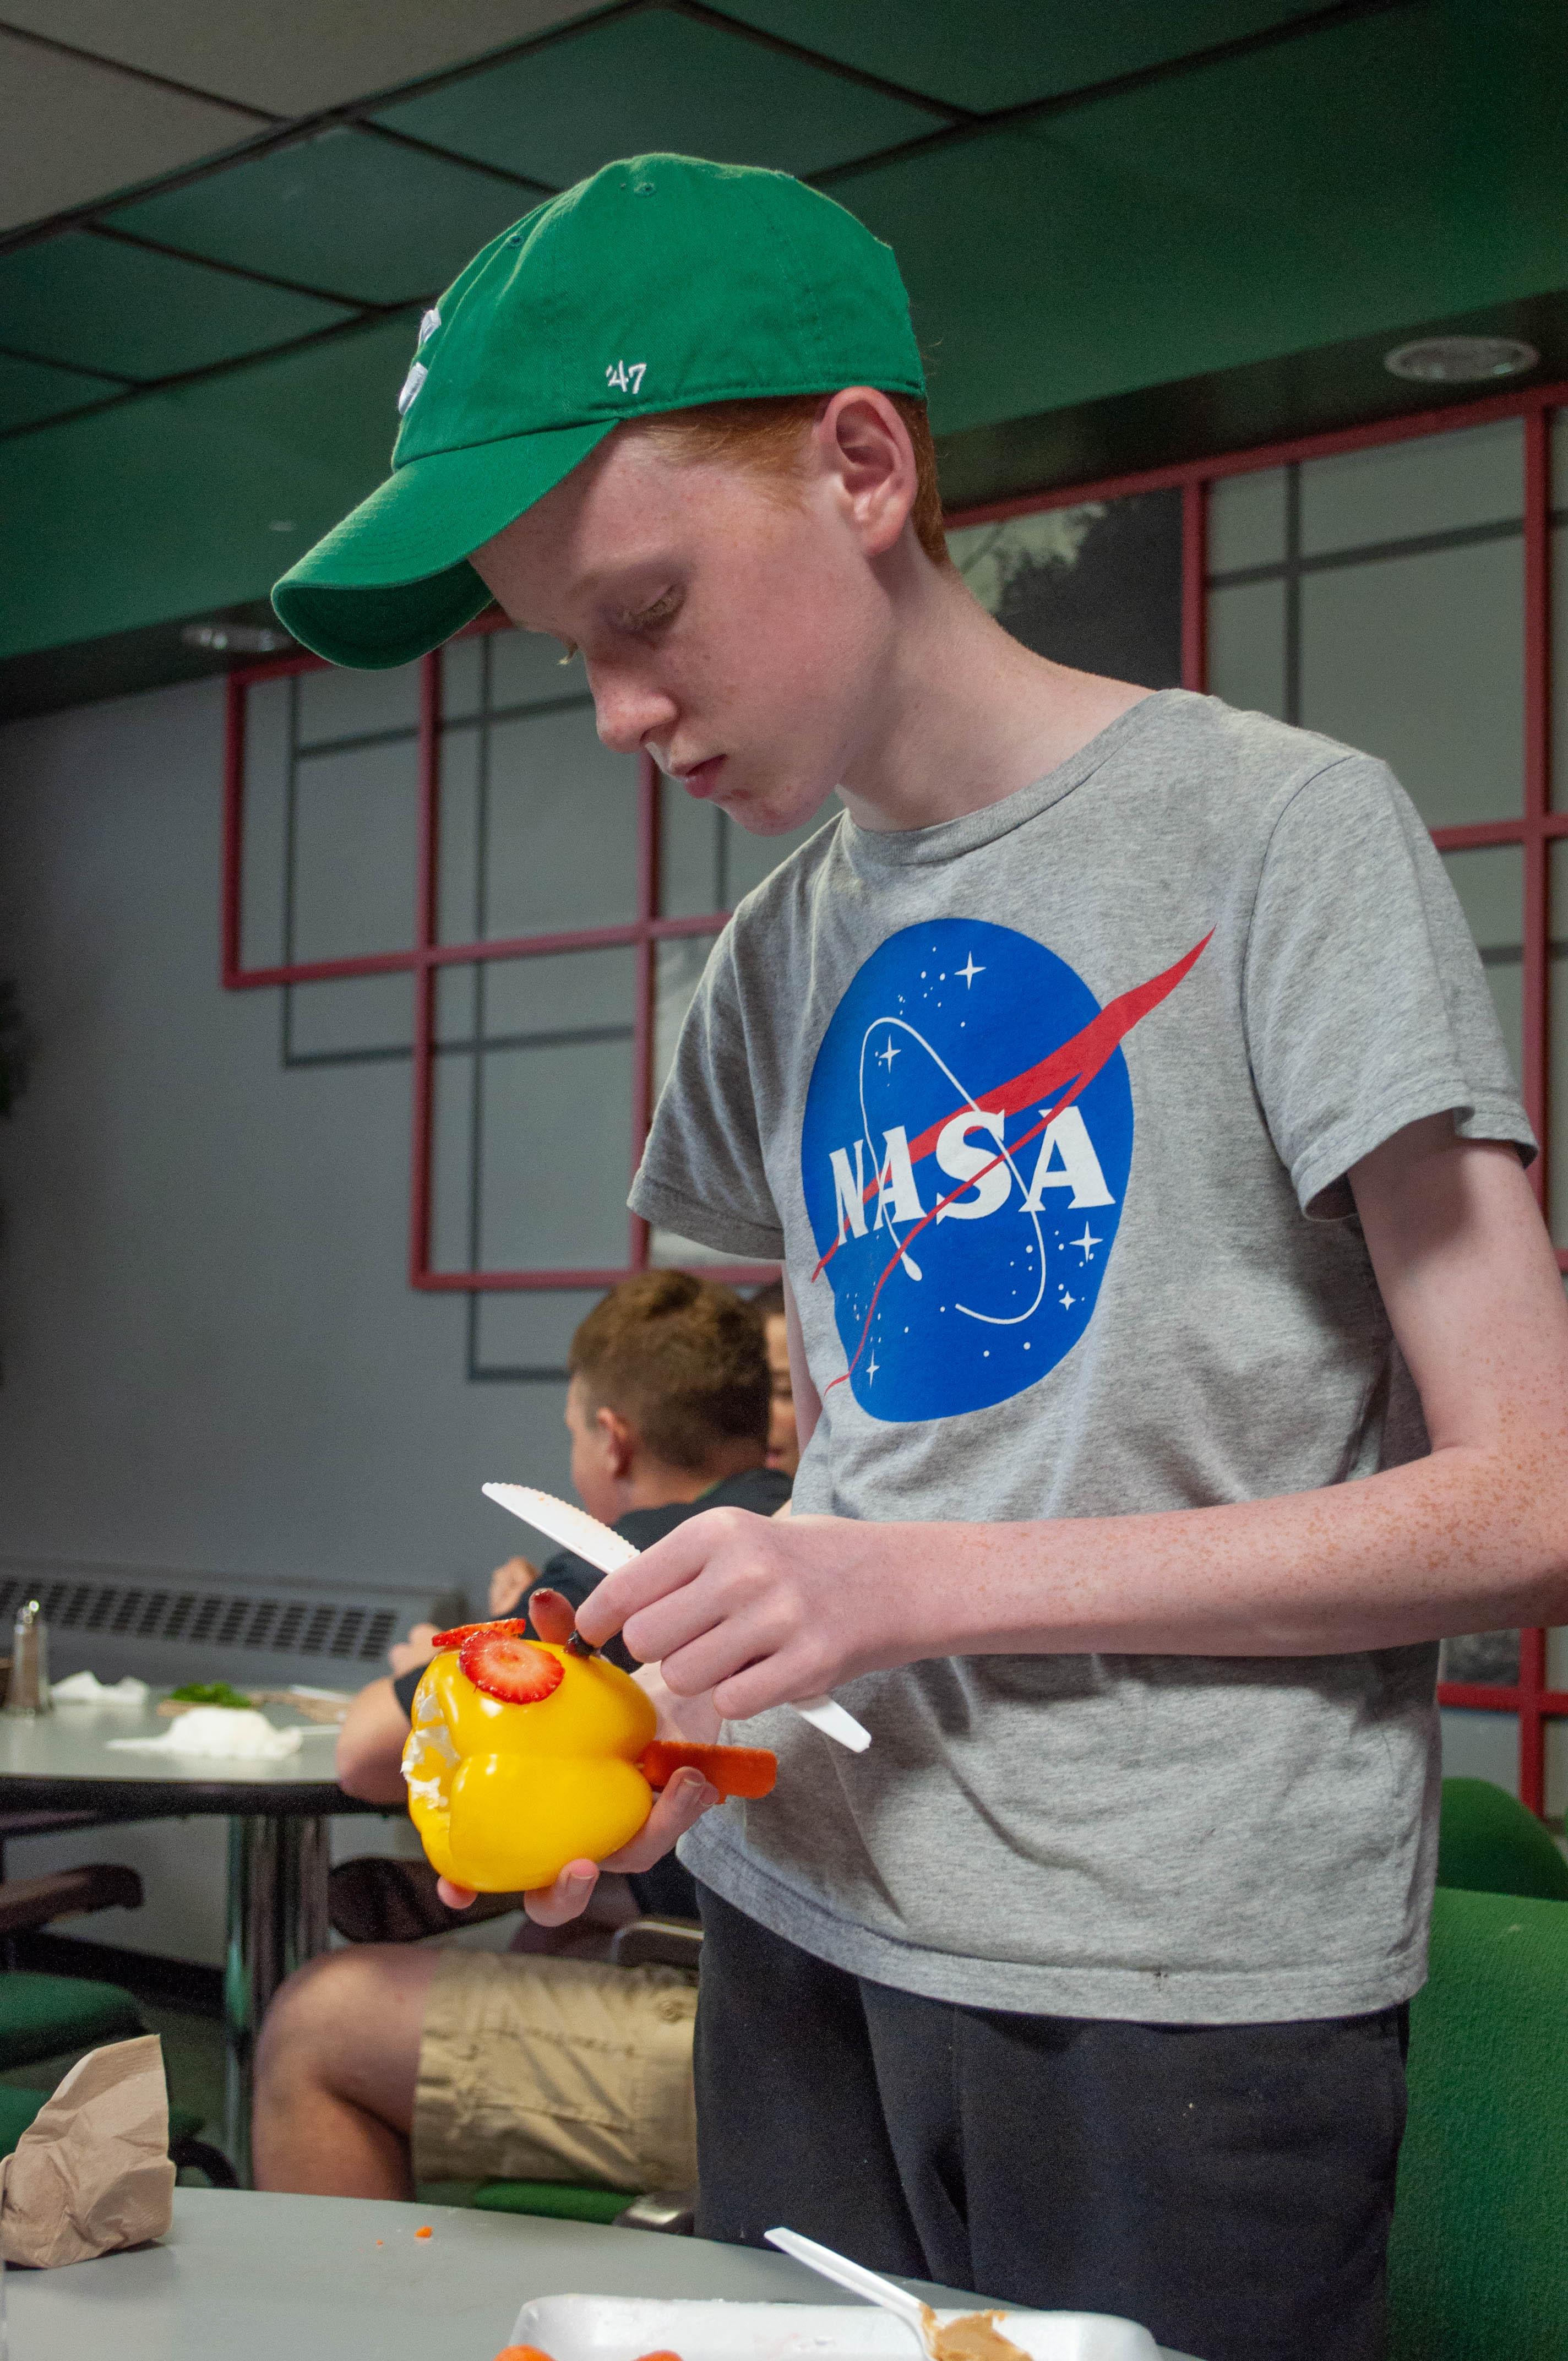 Child creating vegetable art